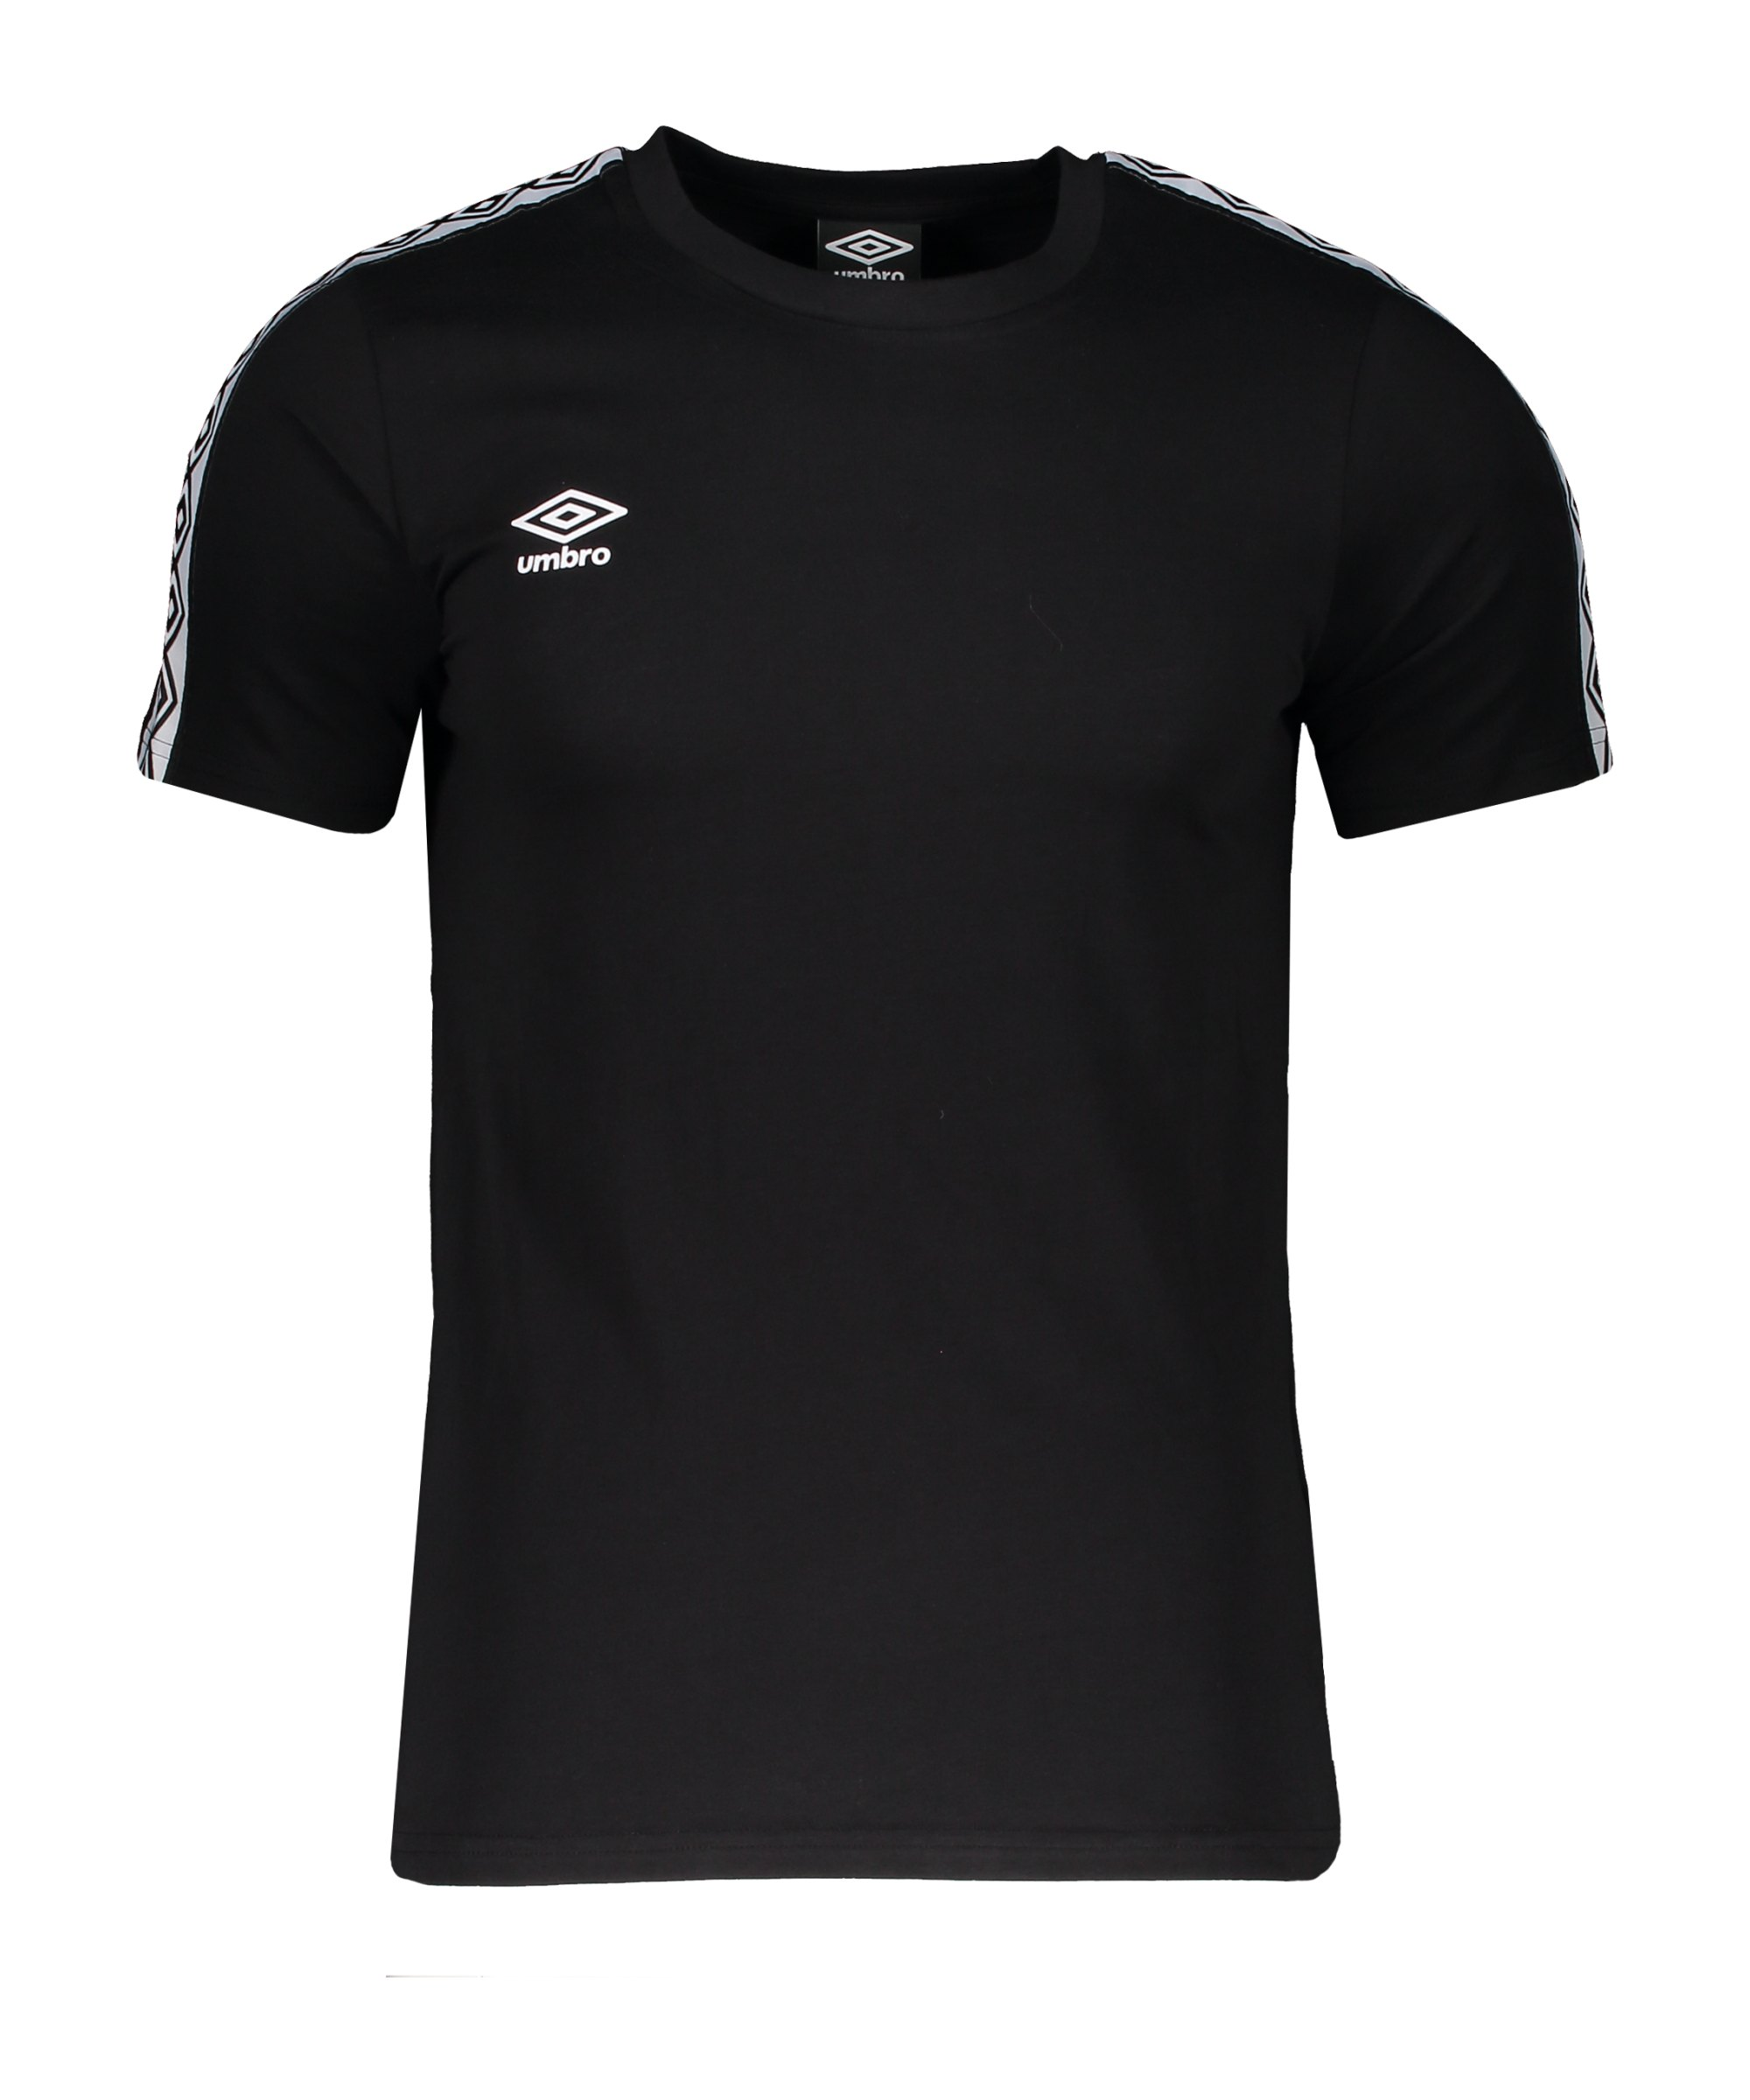 Umbro FW Taped T-Shirt Schwarz F060 - schwarz